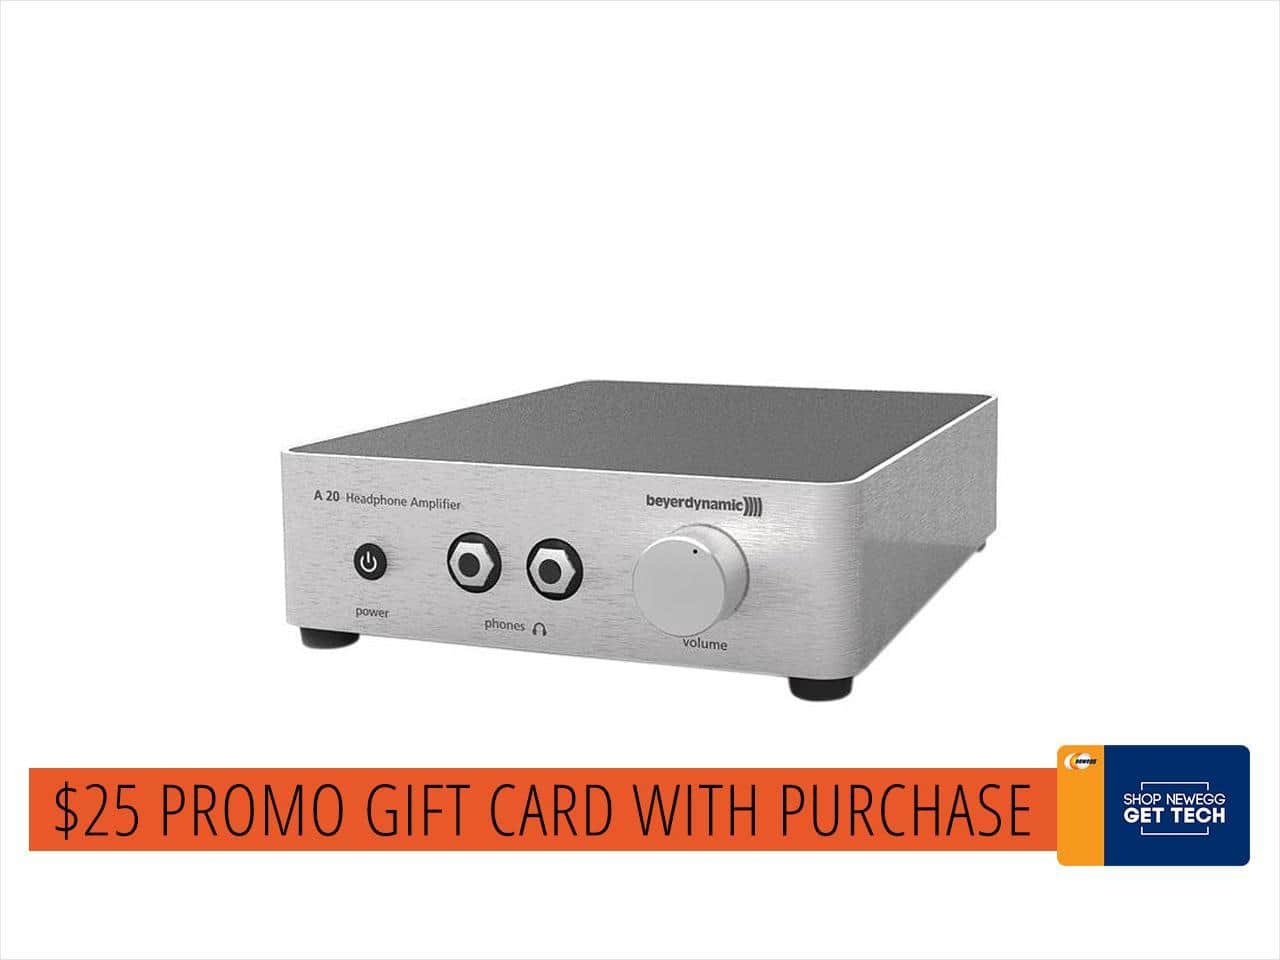 Beyerdynamic A20 Headphone Amplifier + $25 Newegg Promo Gift Card $300 + free s/h